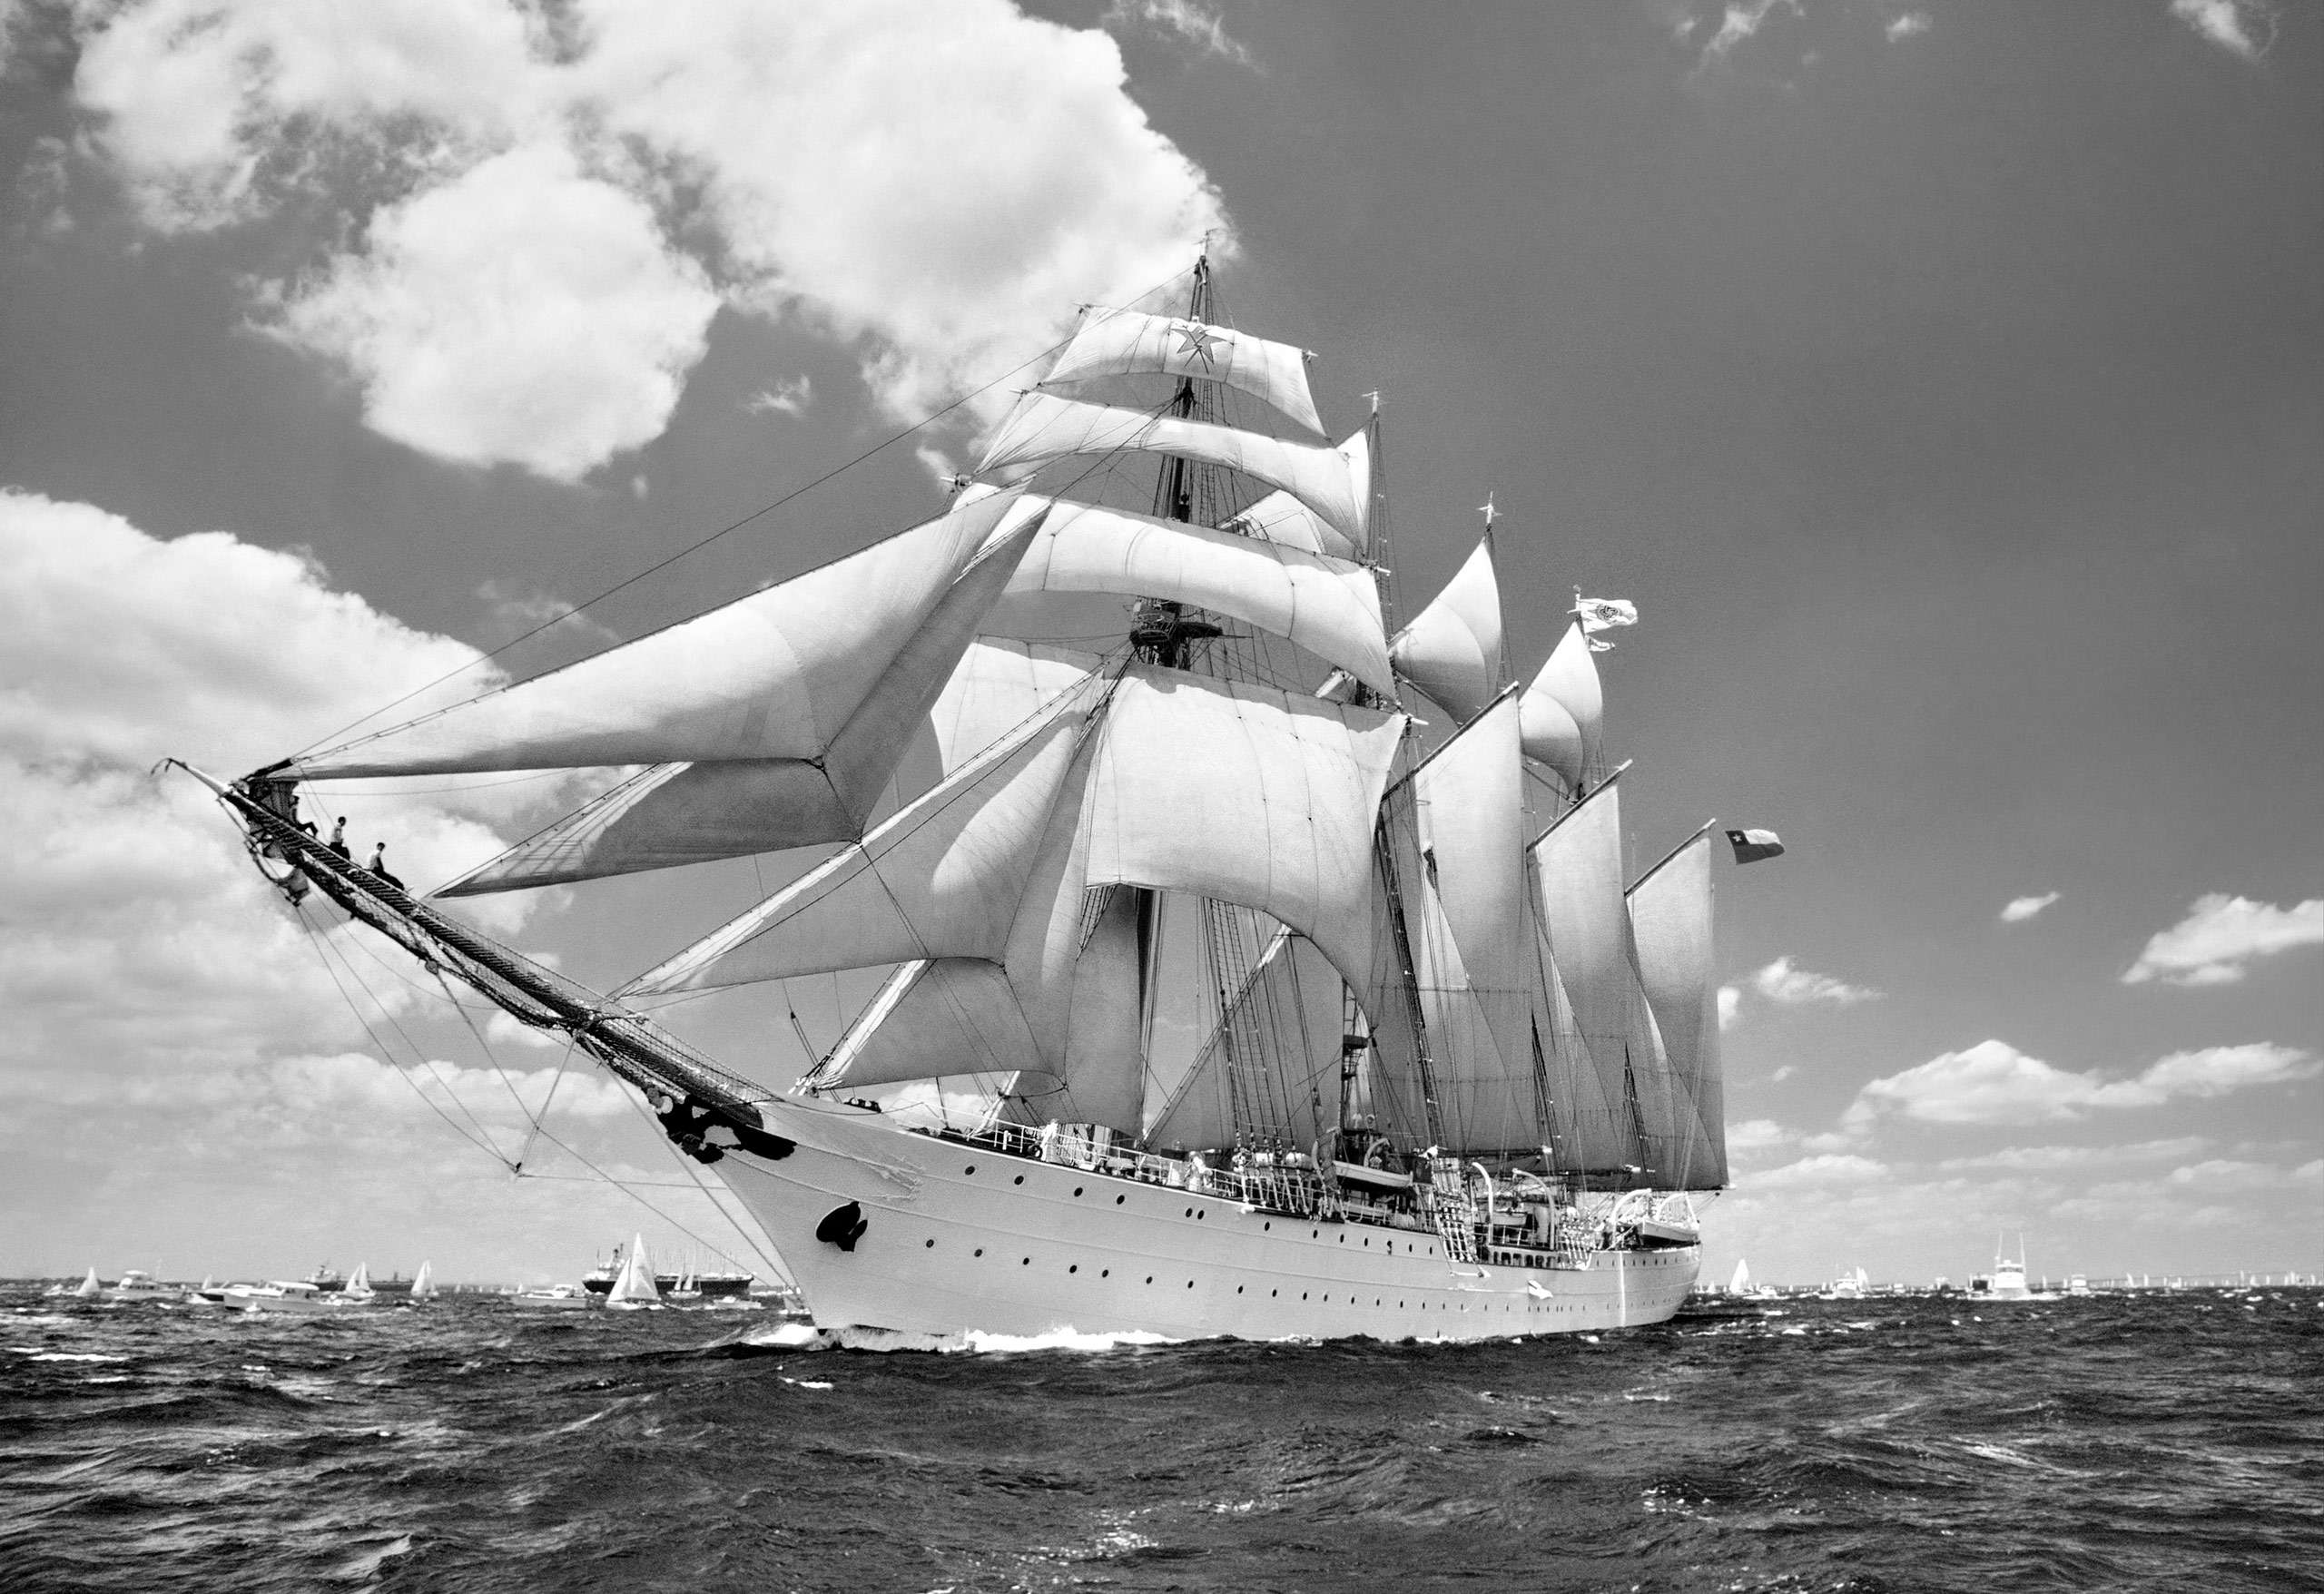 PORTFOLIO - Sailing - Tall Ships #21-PCG177